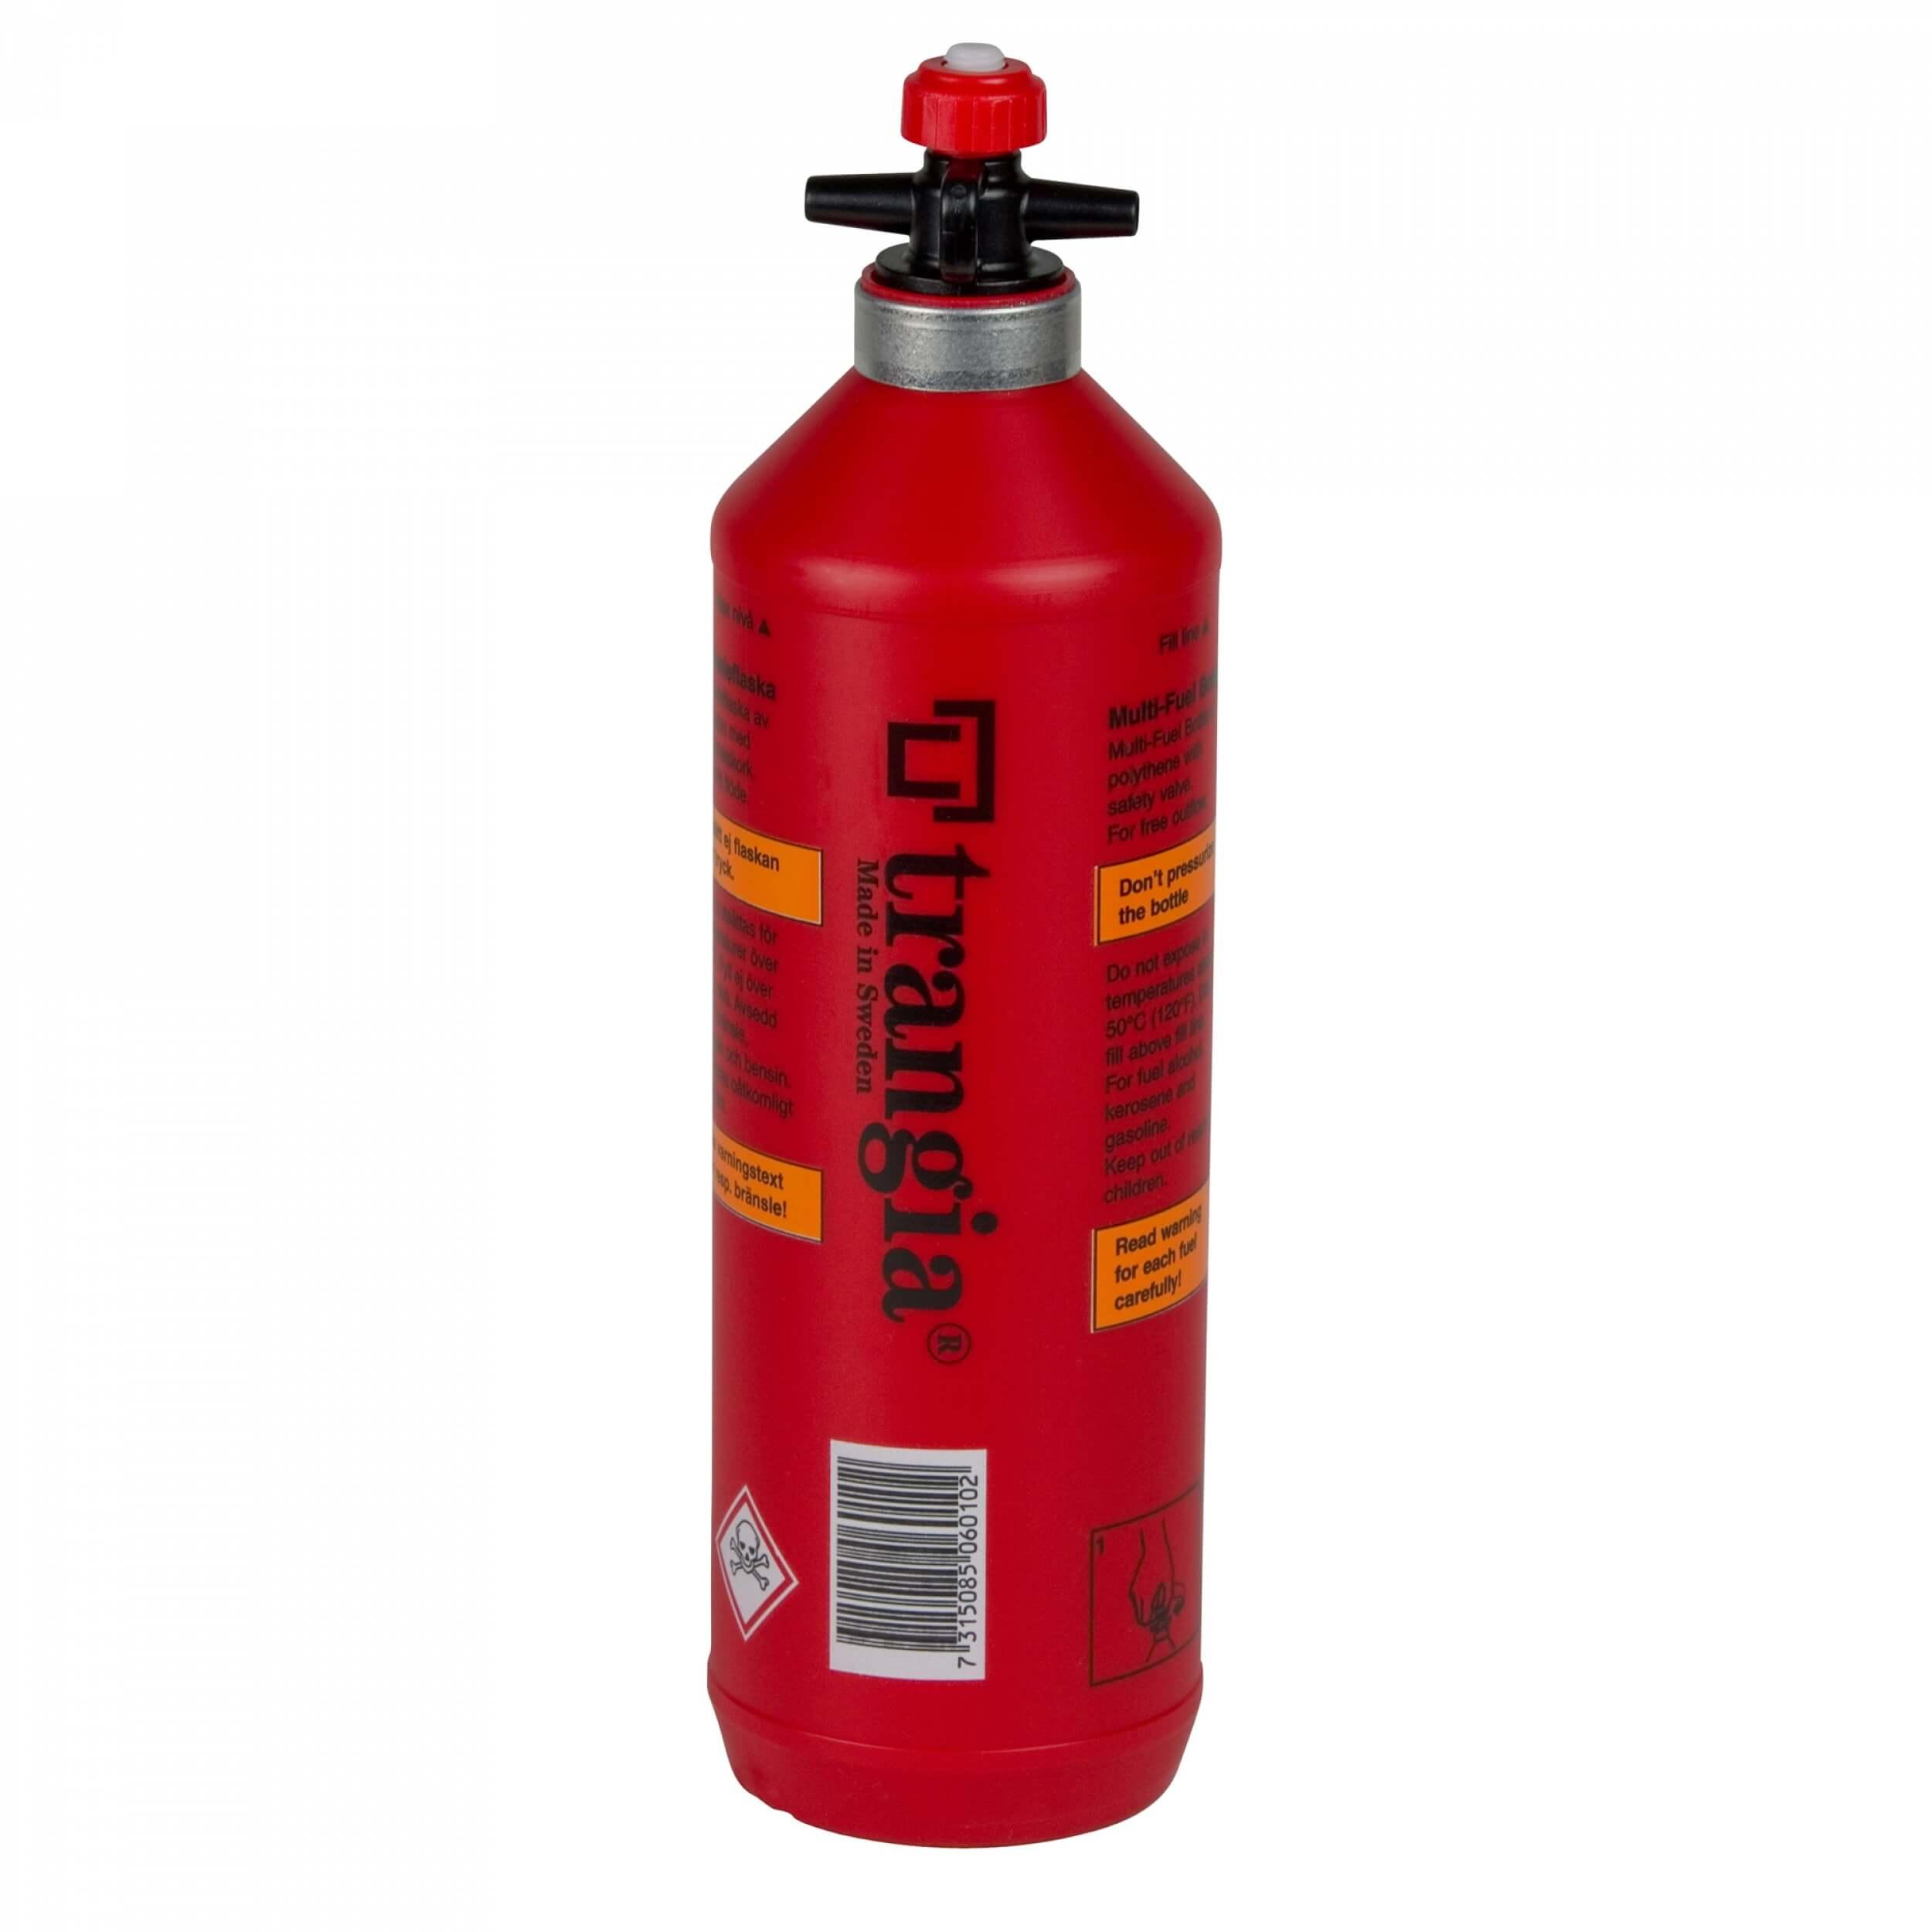 Trangia Sicherheitsflasche 1,0 l